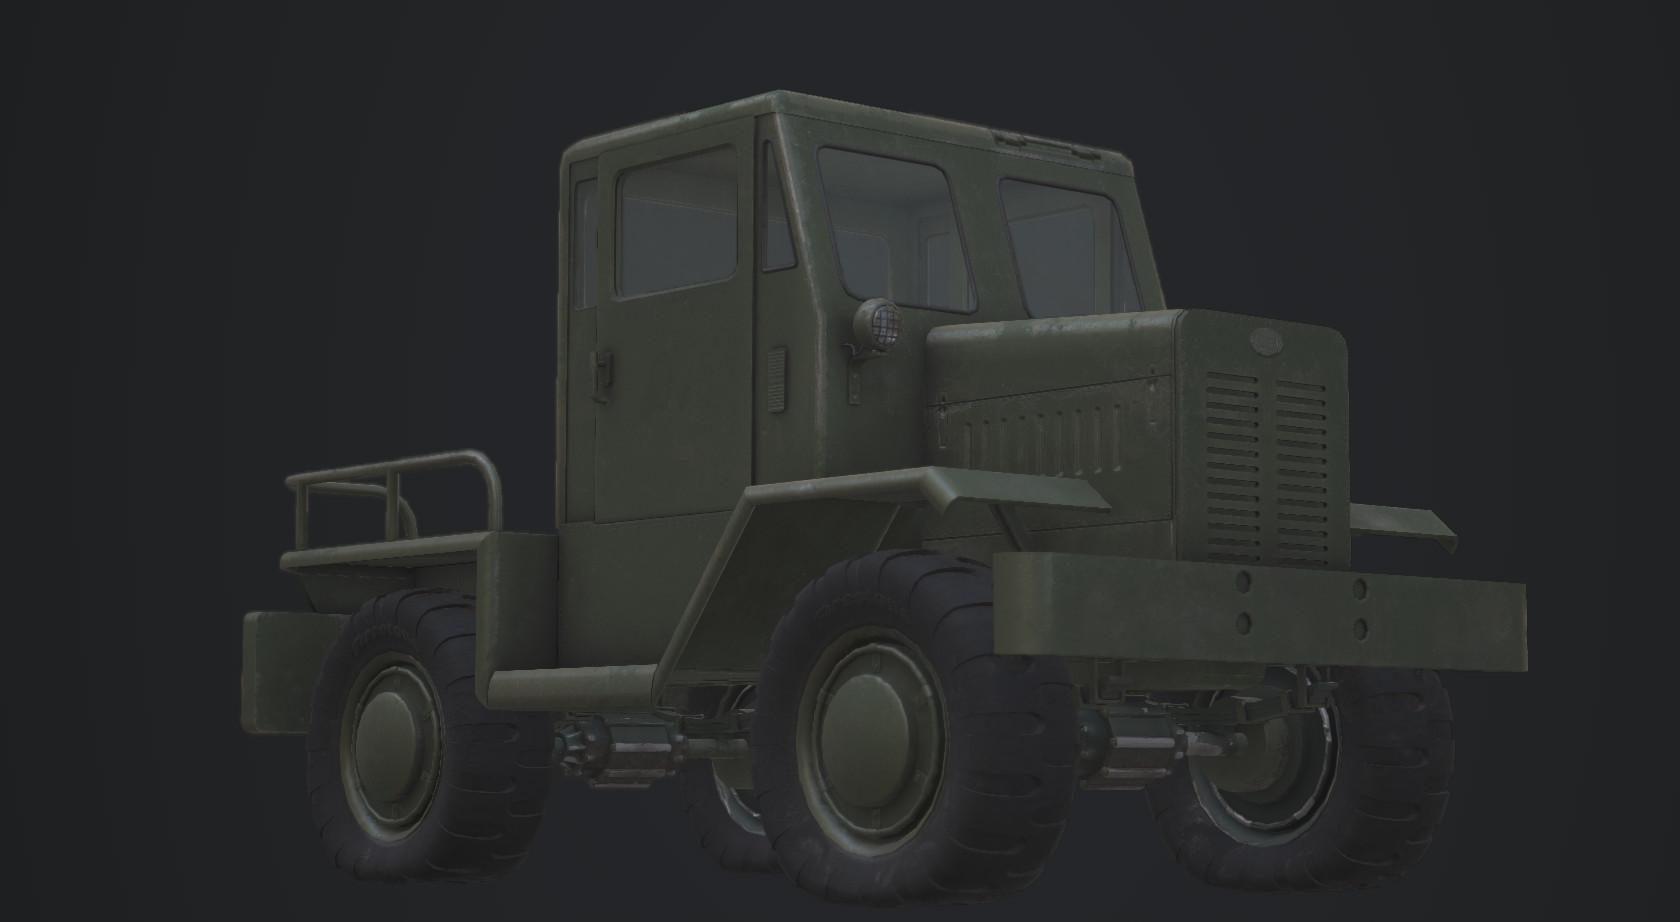 Truck tug test